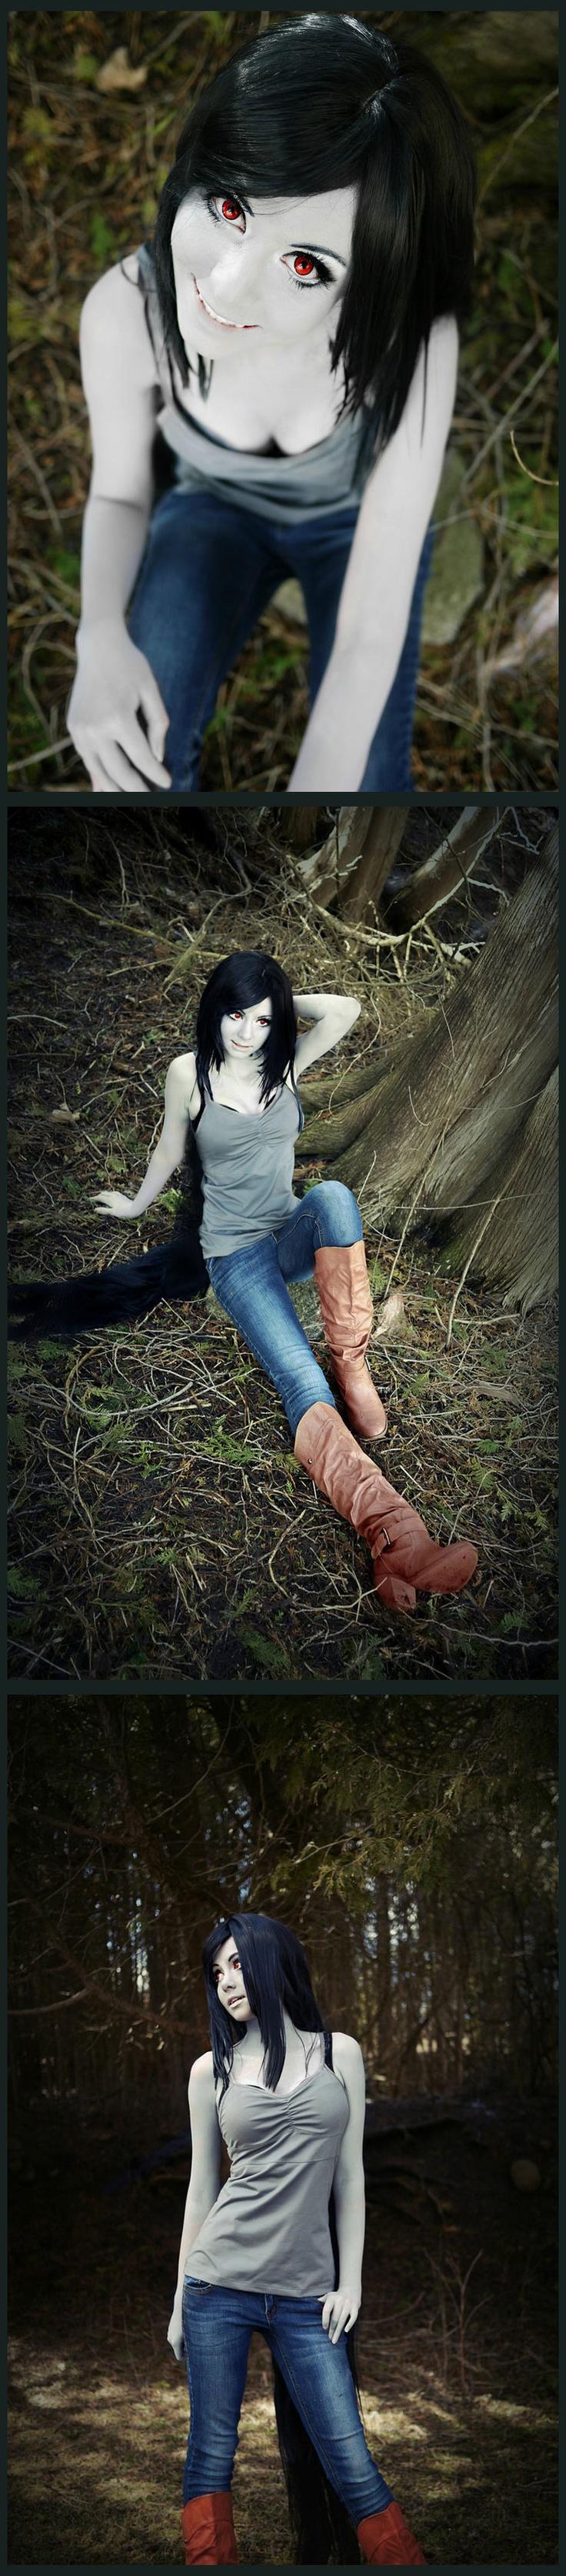 Marceline | http://traumacentregrrl.deviantart.com/art/Marceline-the-Vampire-Queen-364729047